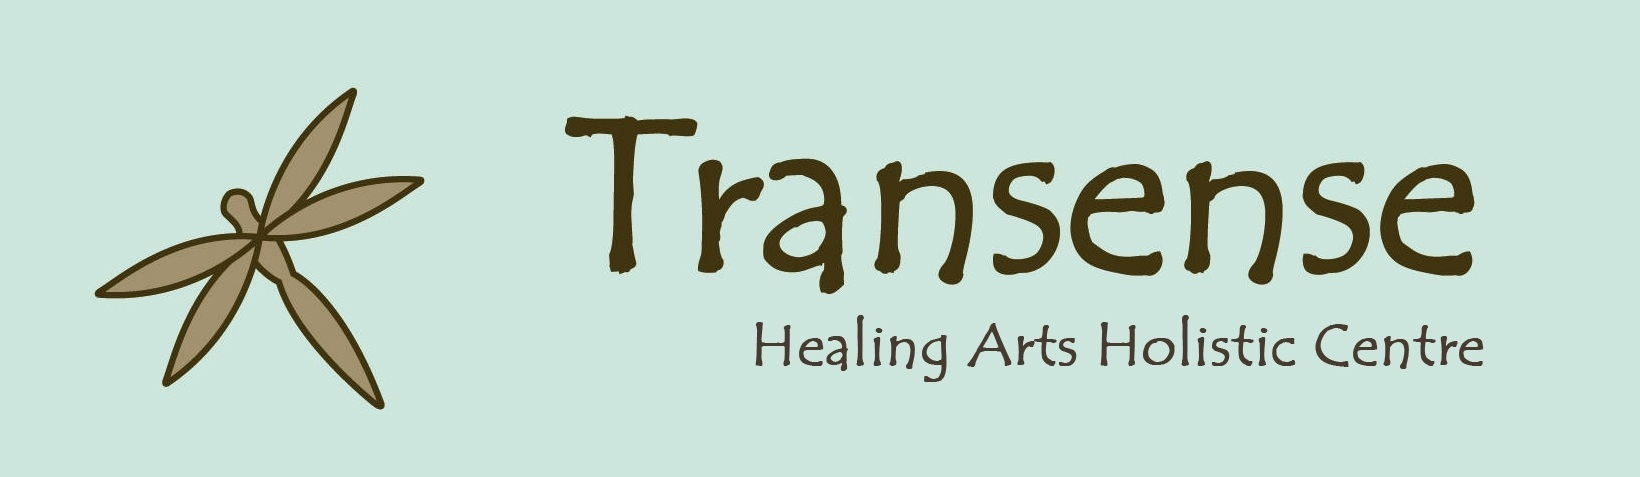 Transense Healing Arts Holistic Centre